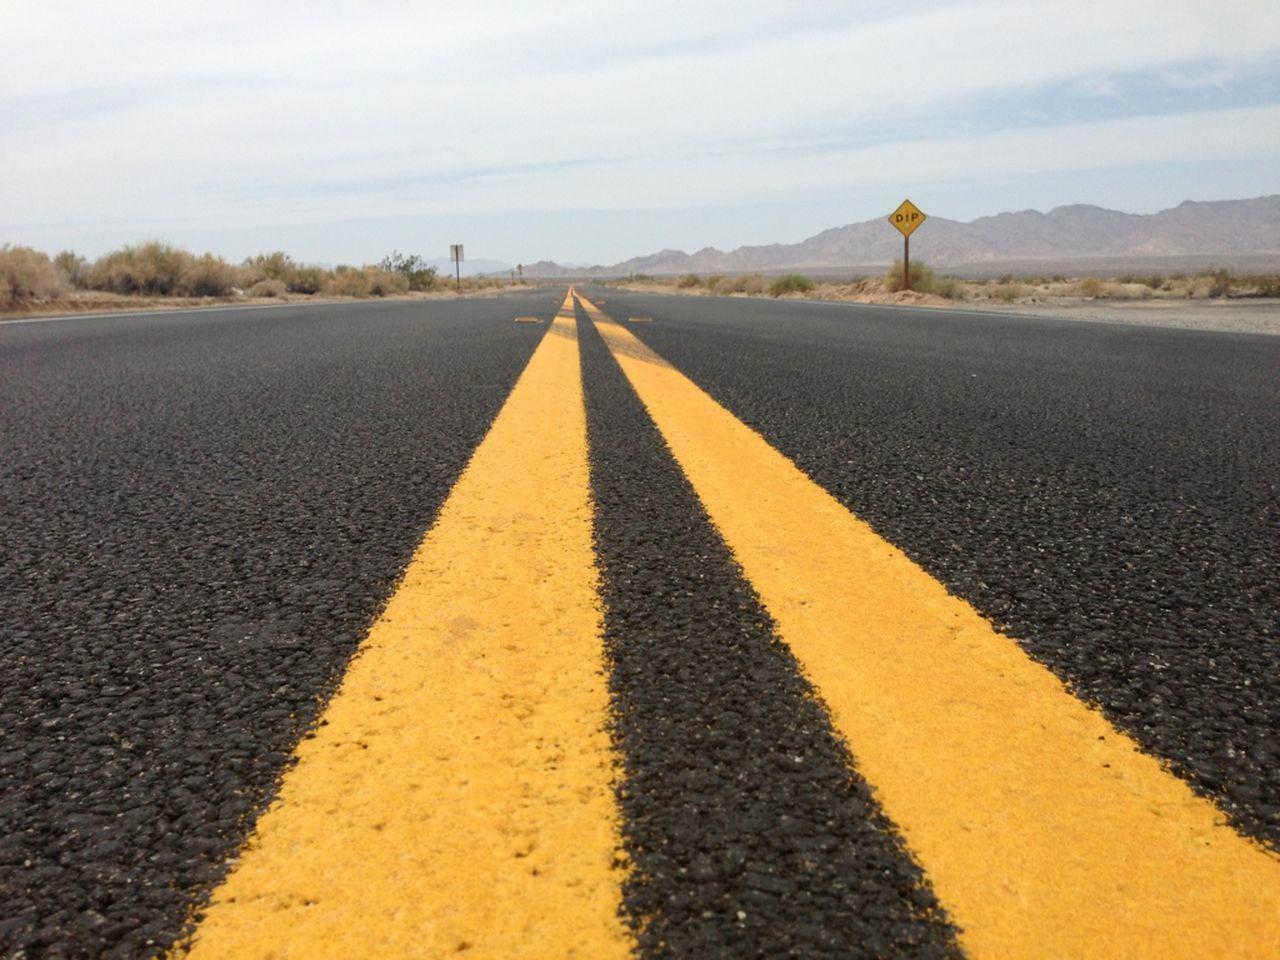 Asphalt Calfornia Empty Road Roadtrip Roadtrip USA Street USA Yellow Lines Route 66 Born To Be Wild Born To Ride